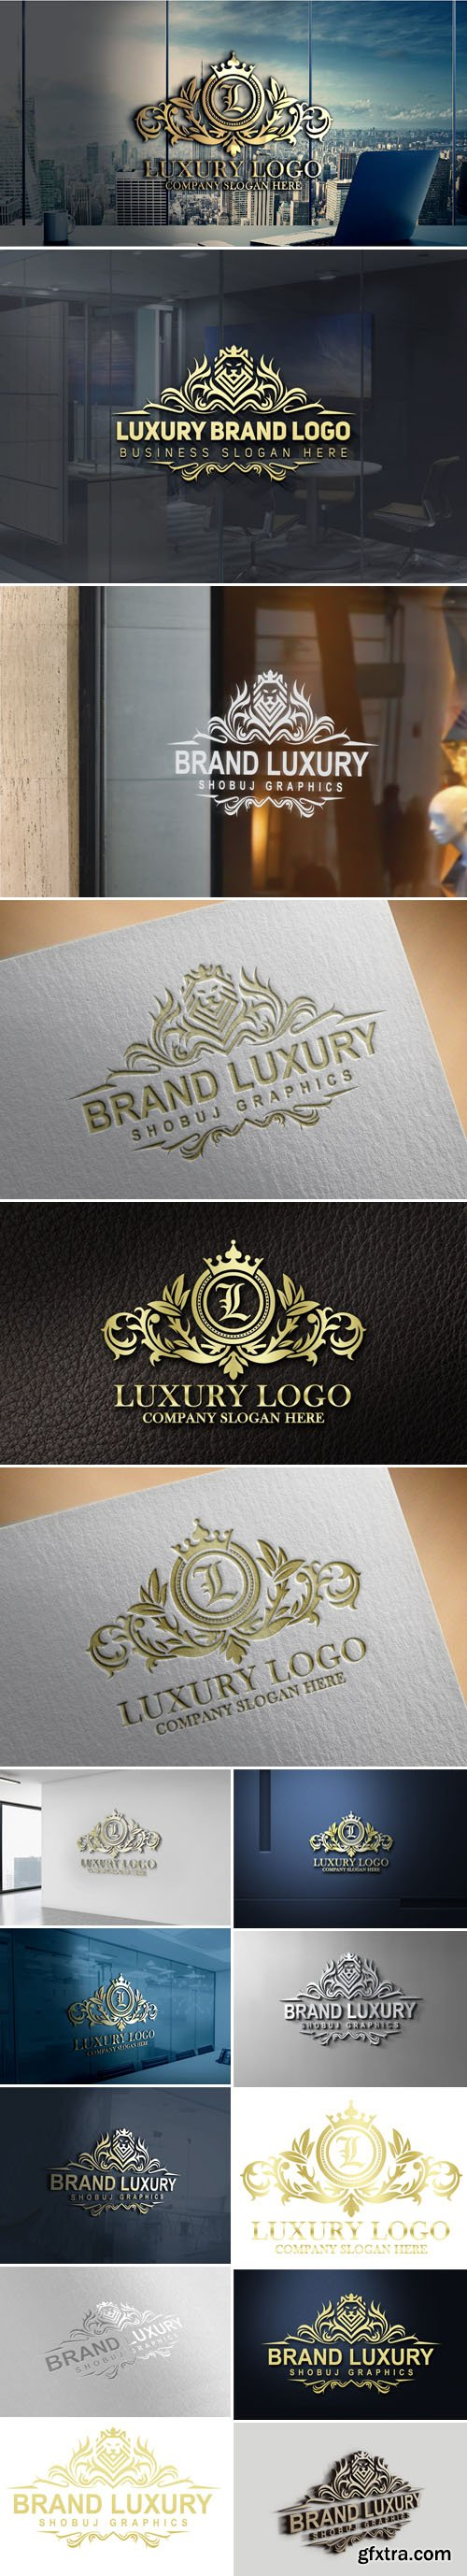 Modern Luxury Brand Logo Design PSD Mockups Templates